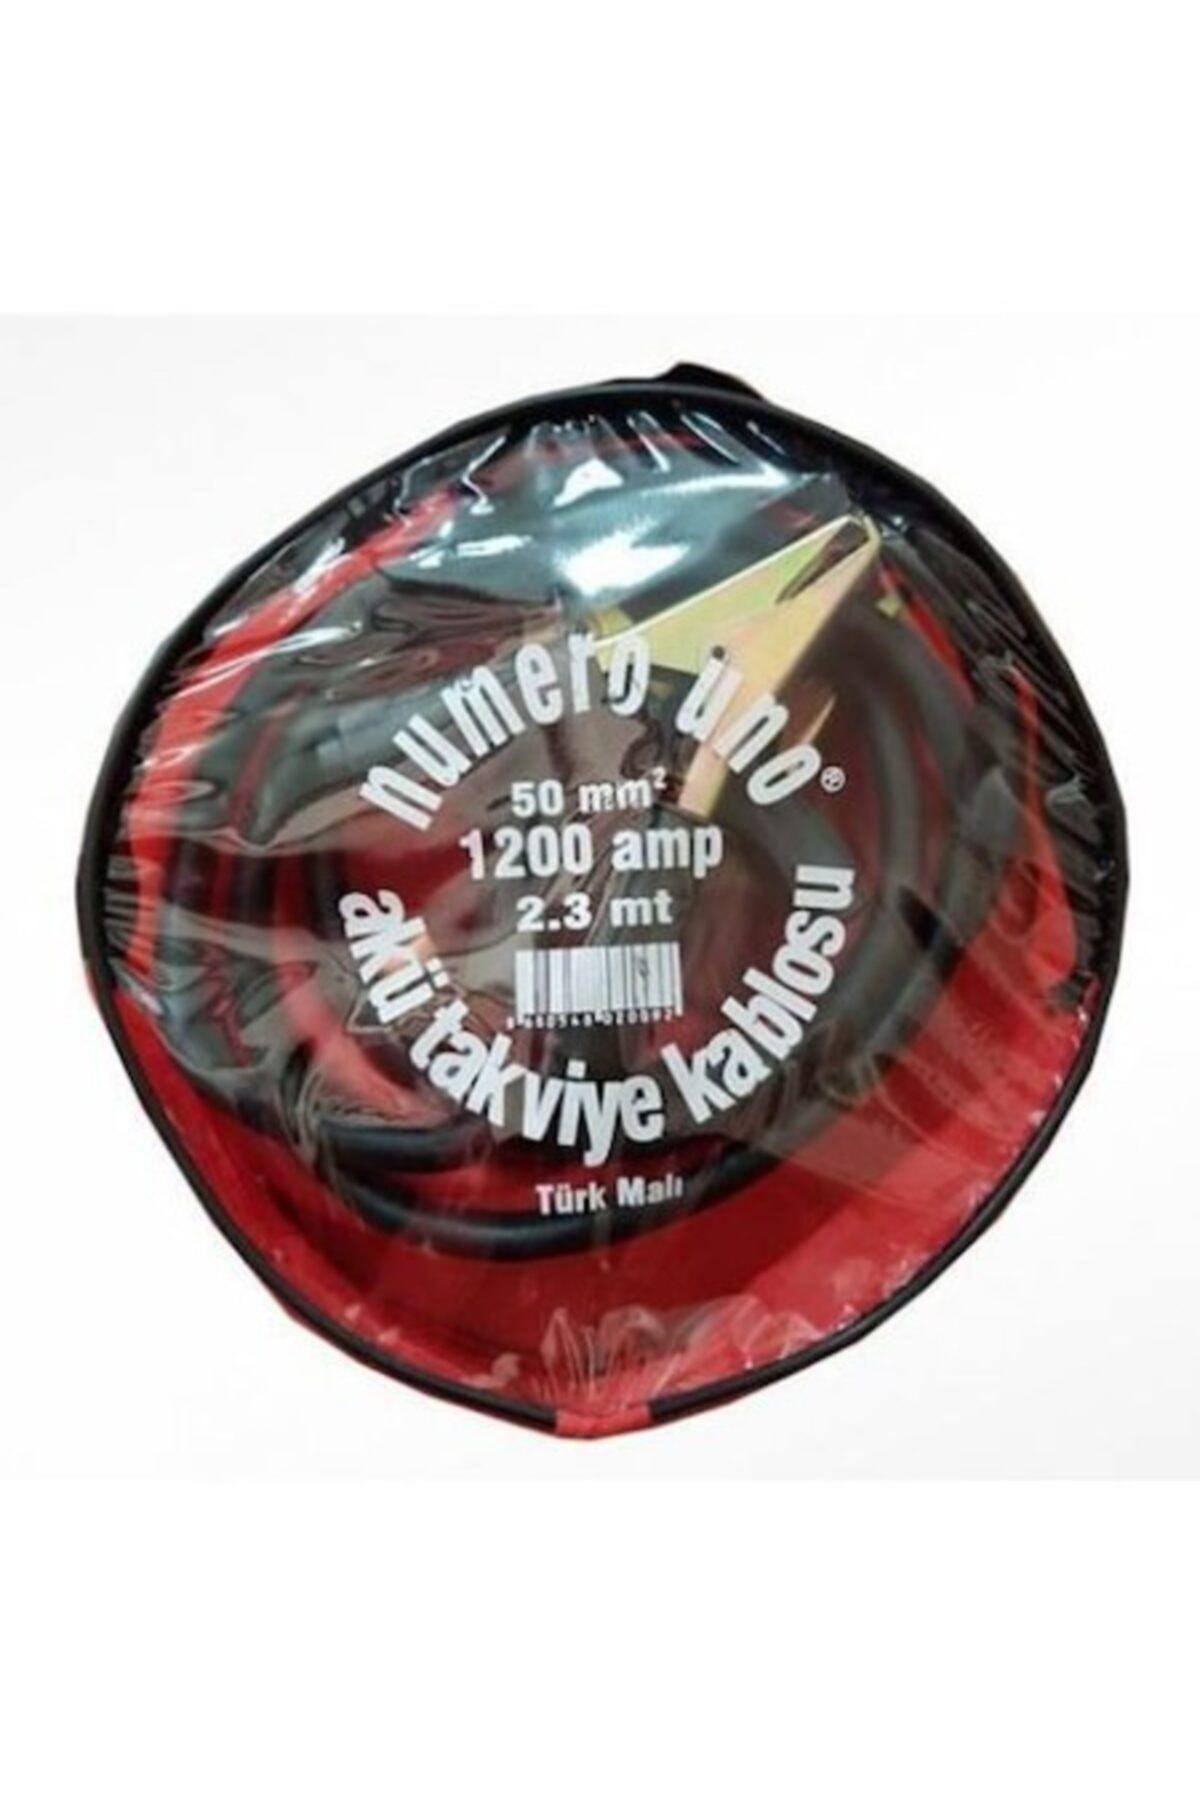 NUMEROUNO Akü Takviye Kablosu 50mm 1200 Amper 2.3 Metre Çantalı Numereuno 1